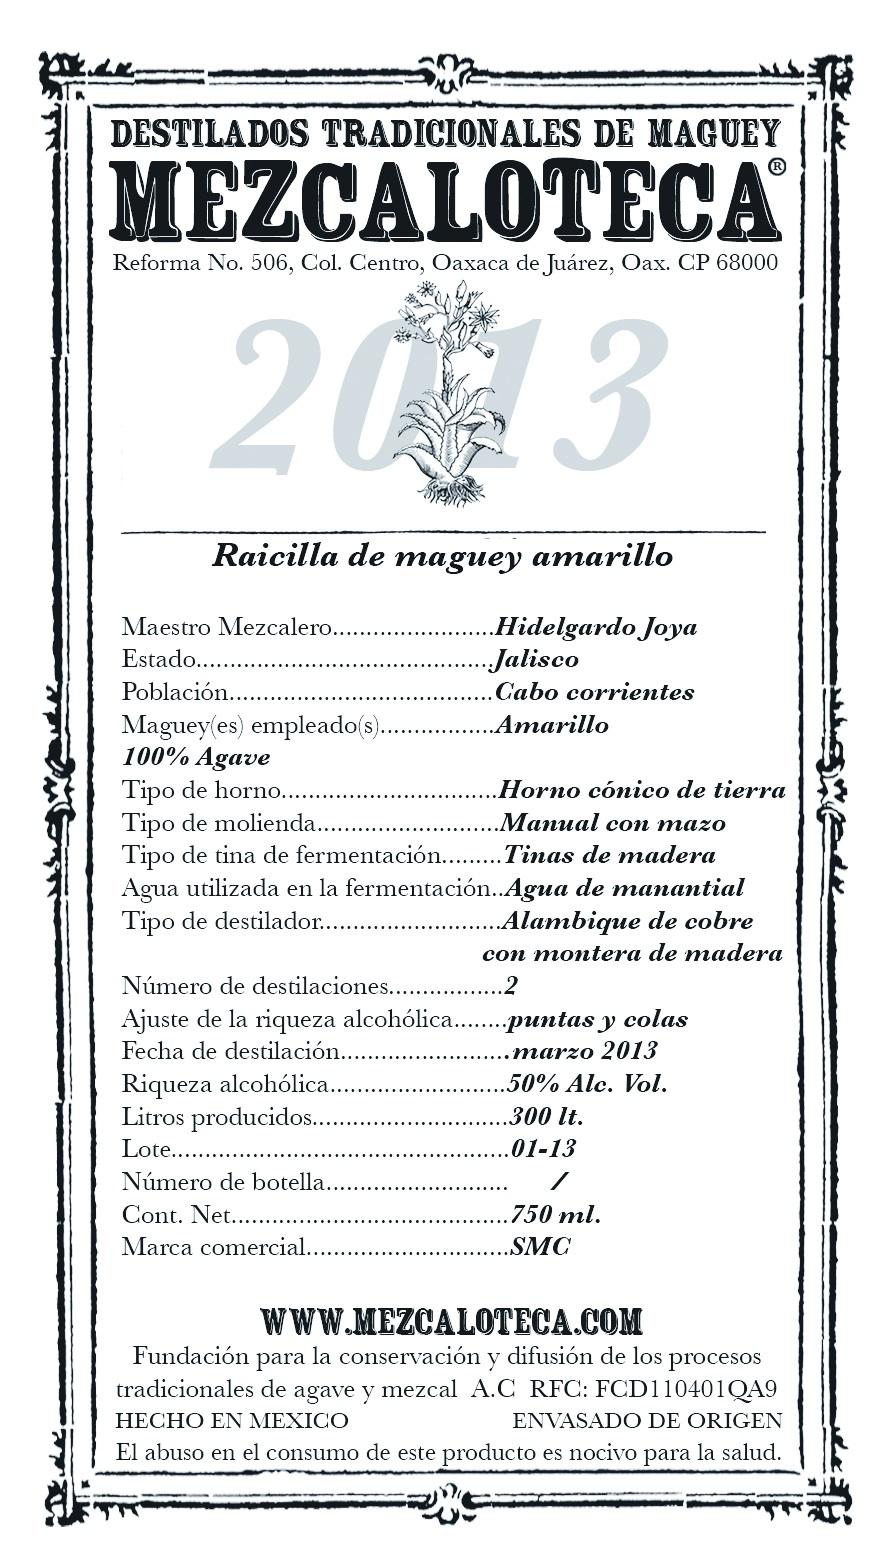 jalisco.raicilla.HJ.amarillo.750.2013(1) web.jpg